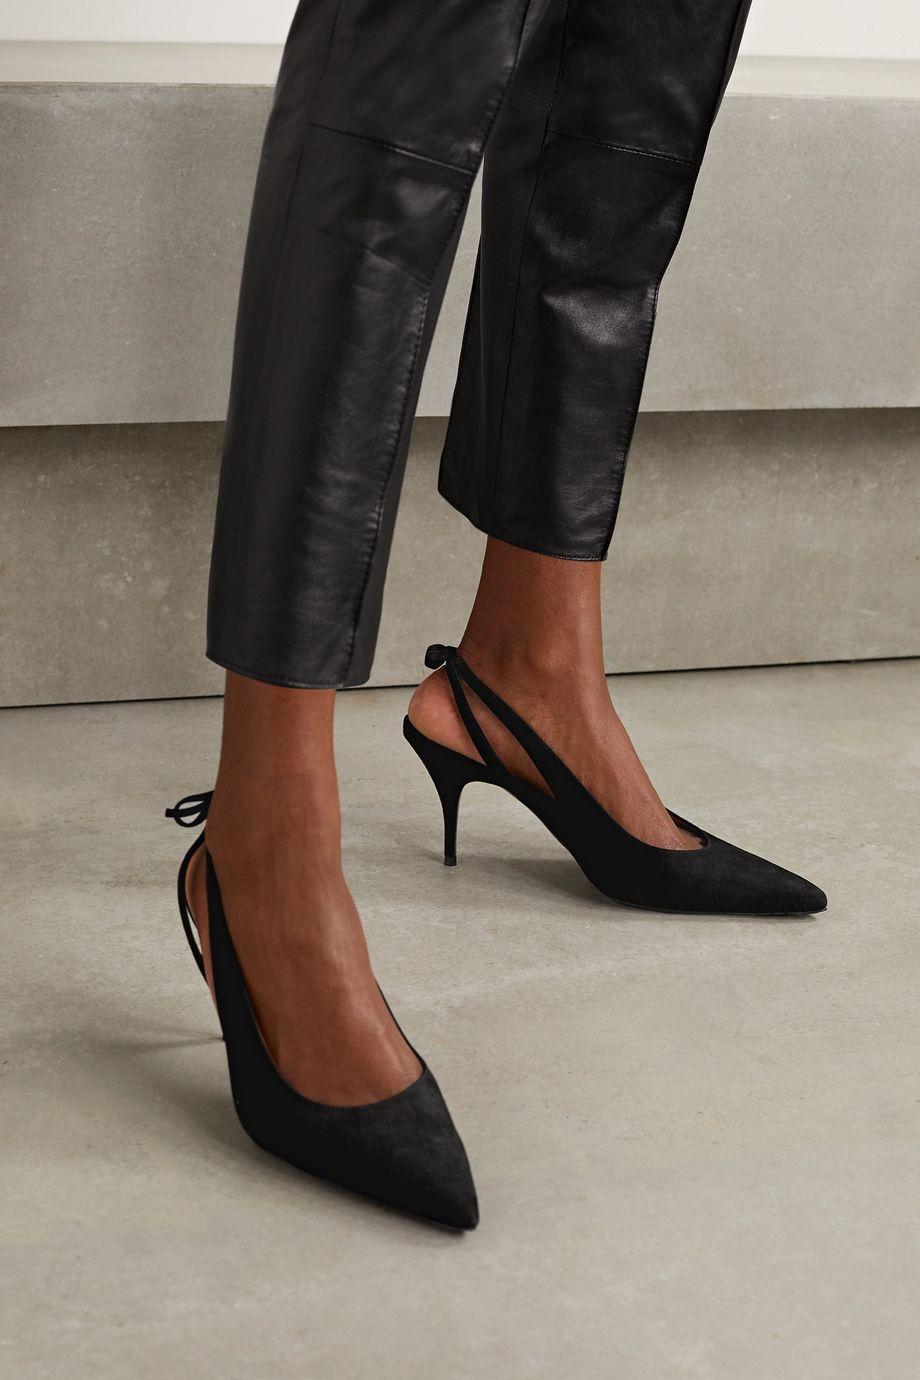 Tabitha Simmons Erika bow-embellished suede slingback pumps